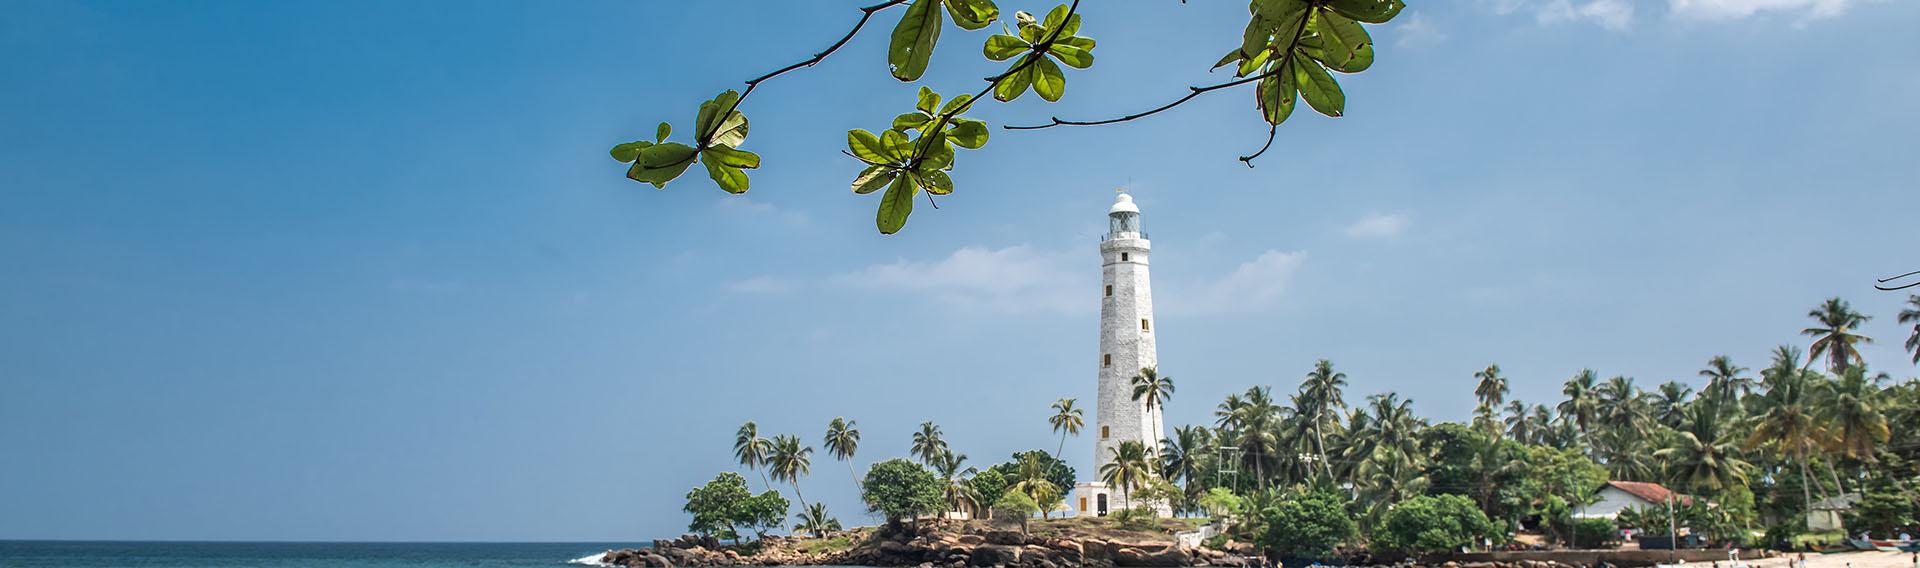 Sri Lanka, activités nautiques, surf